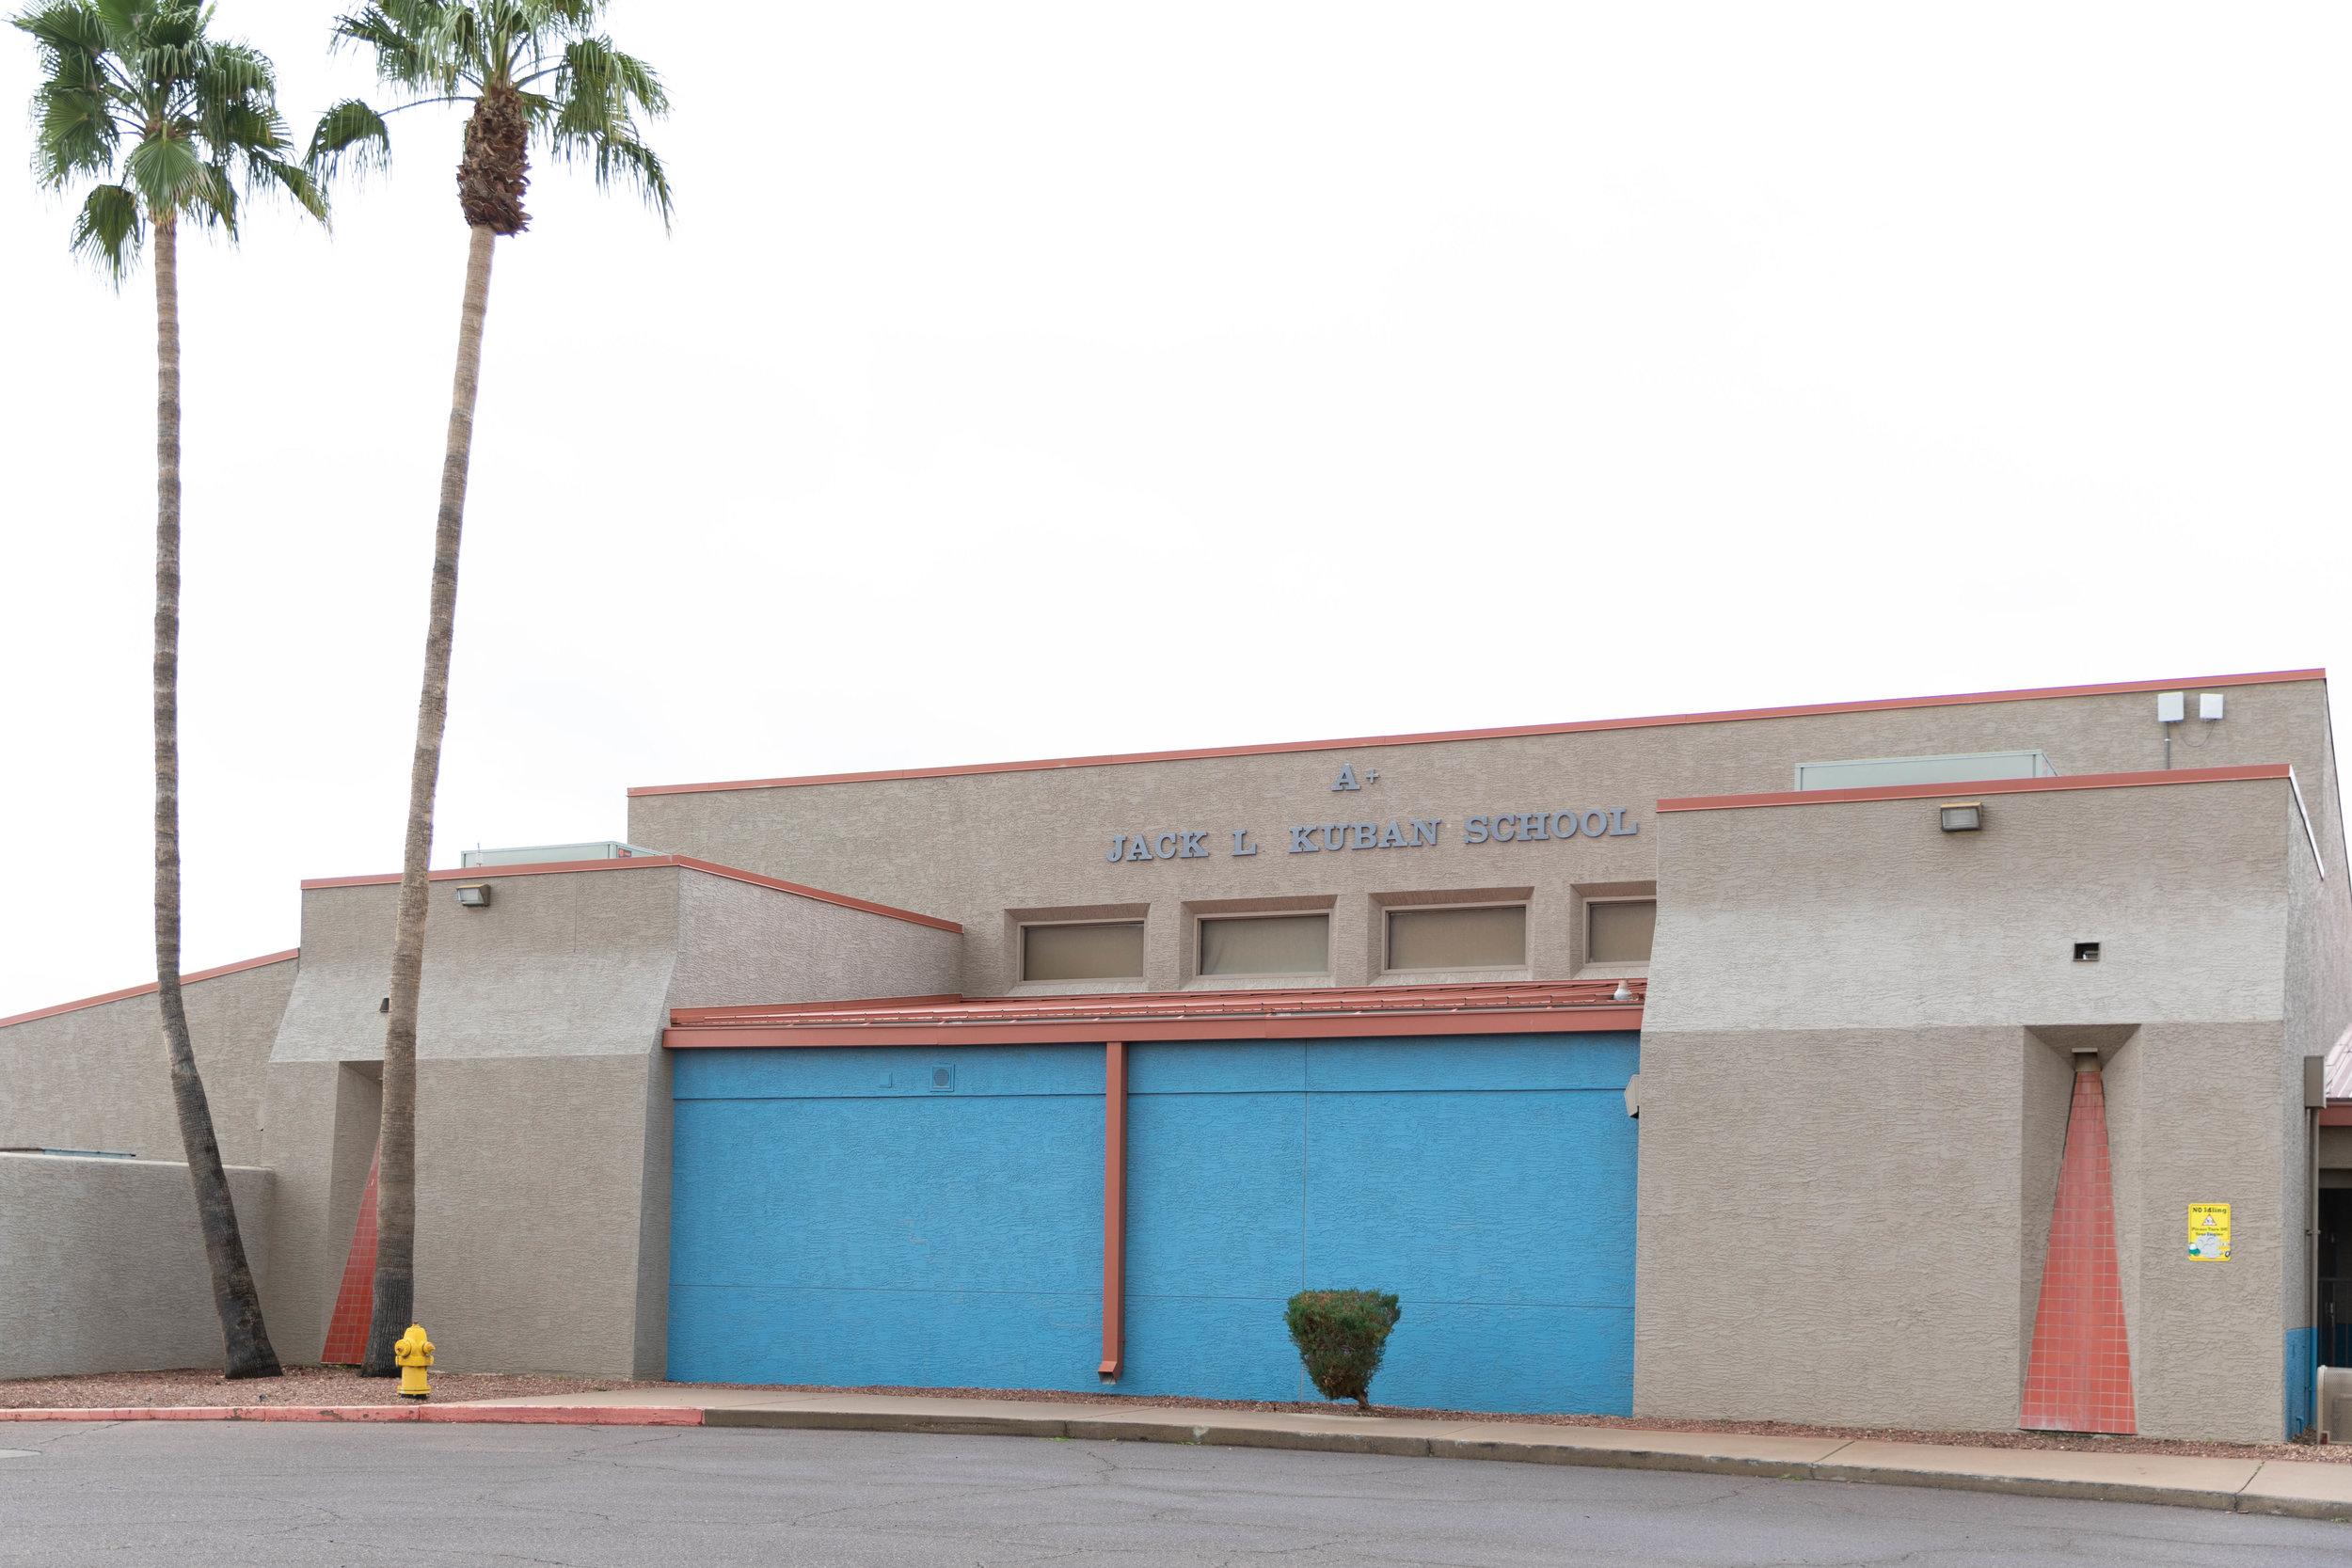 The front of Kuban Elementary School